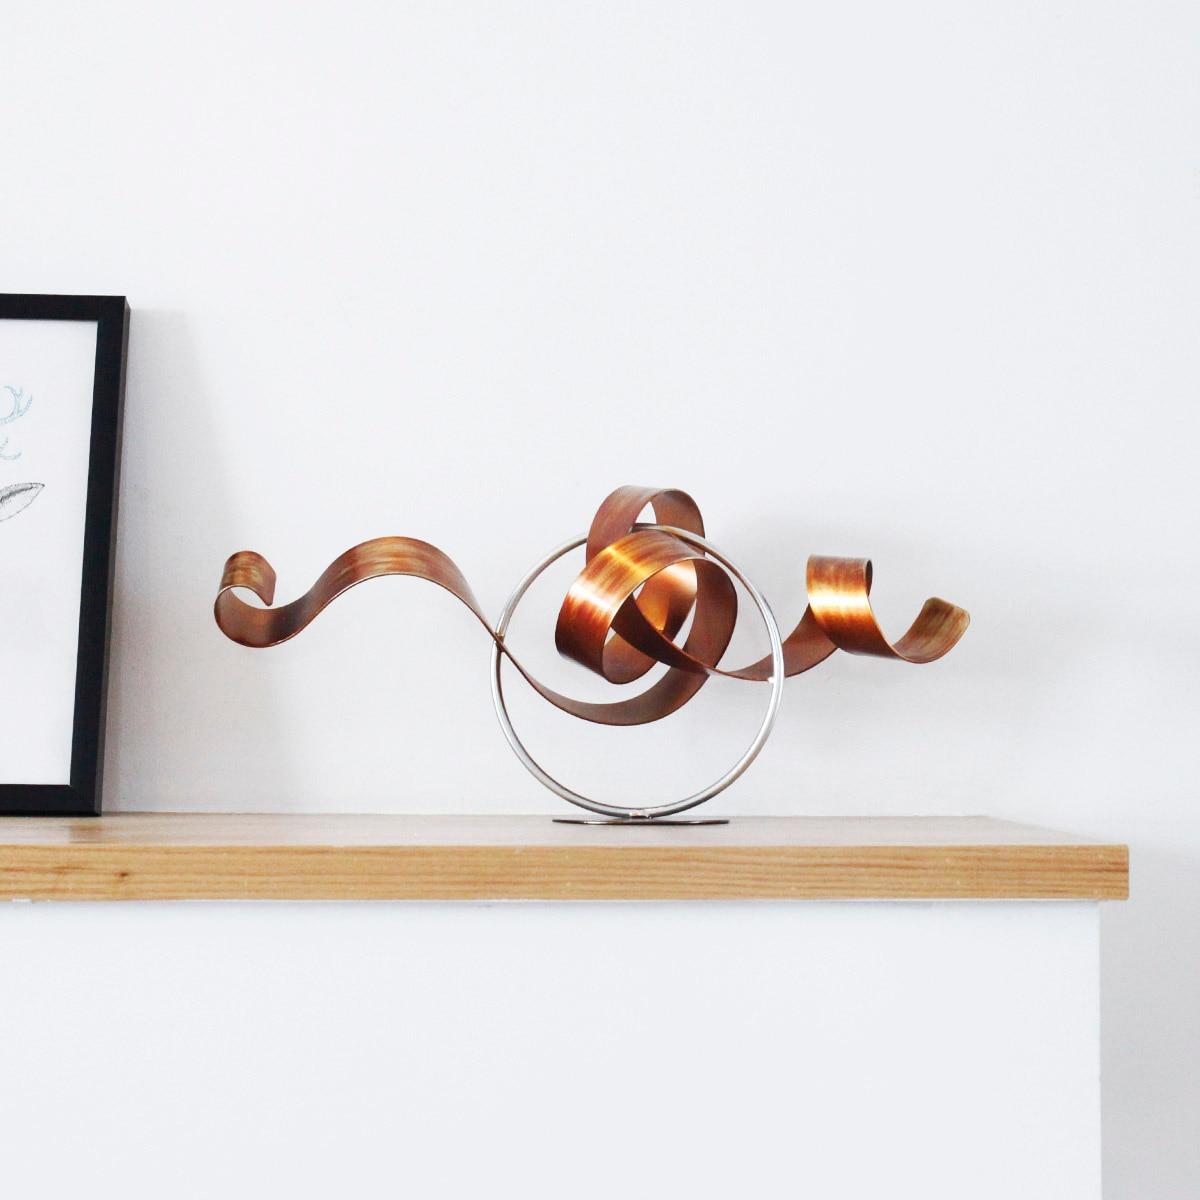 Fashionable Iron Wriggle Modern Sculpture Abstract Sculpture Artwork Metal Sculpture Iron Home Decoration Indoor Outdoor Decor